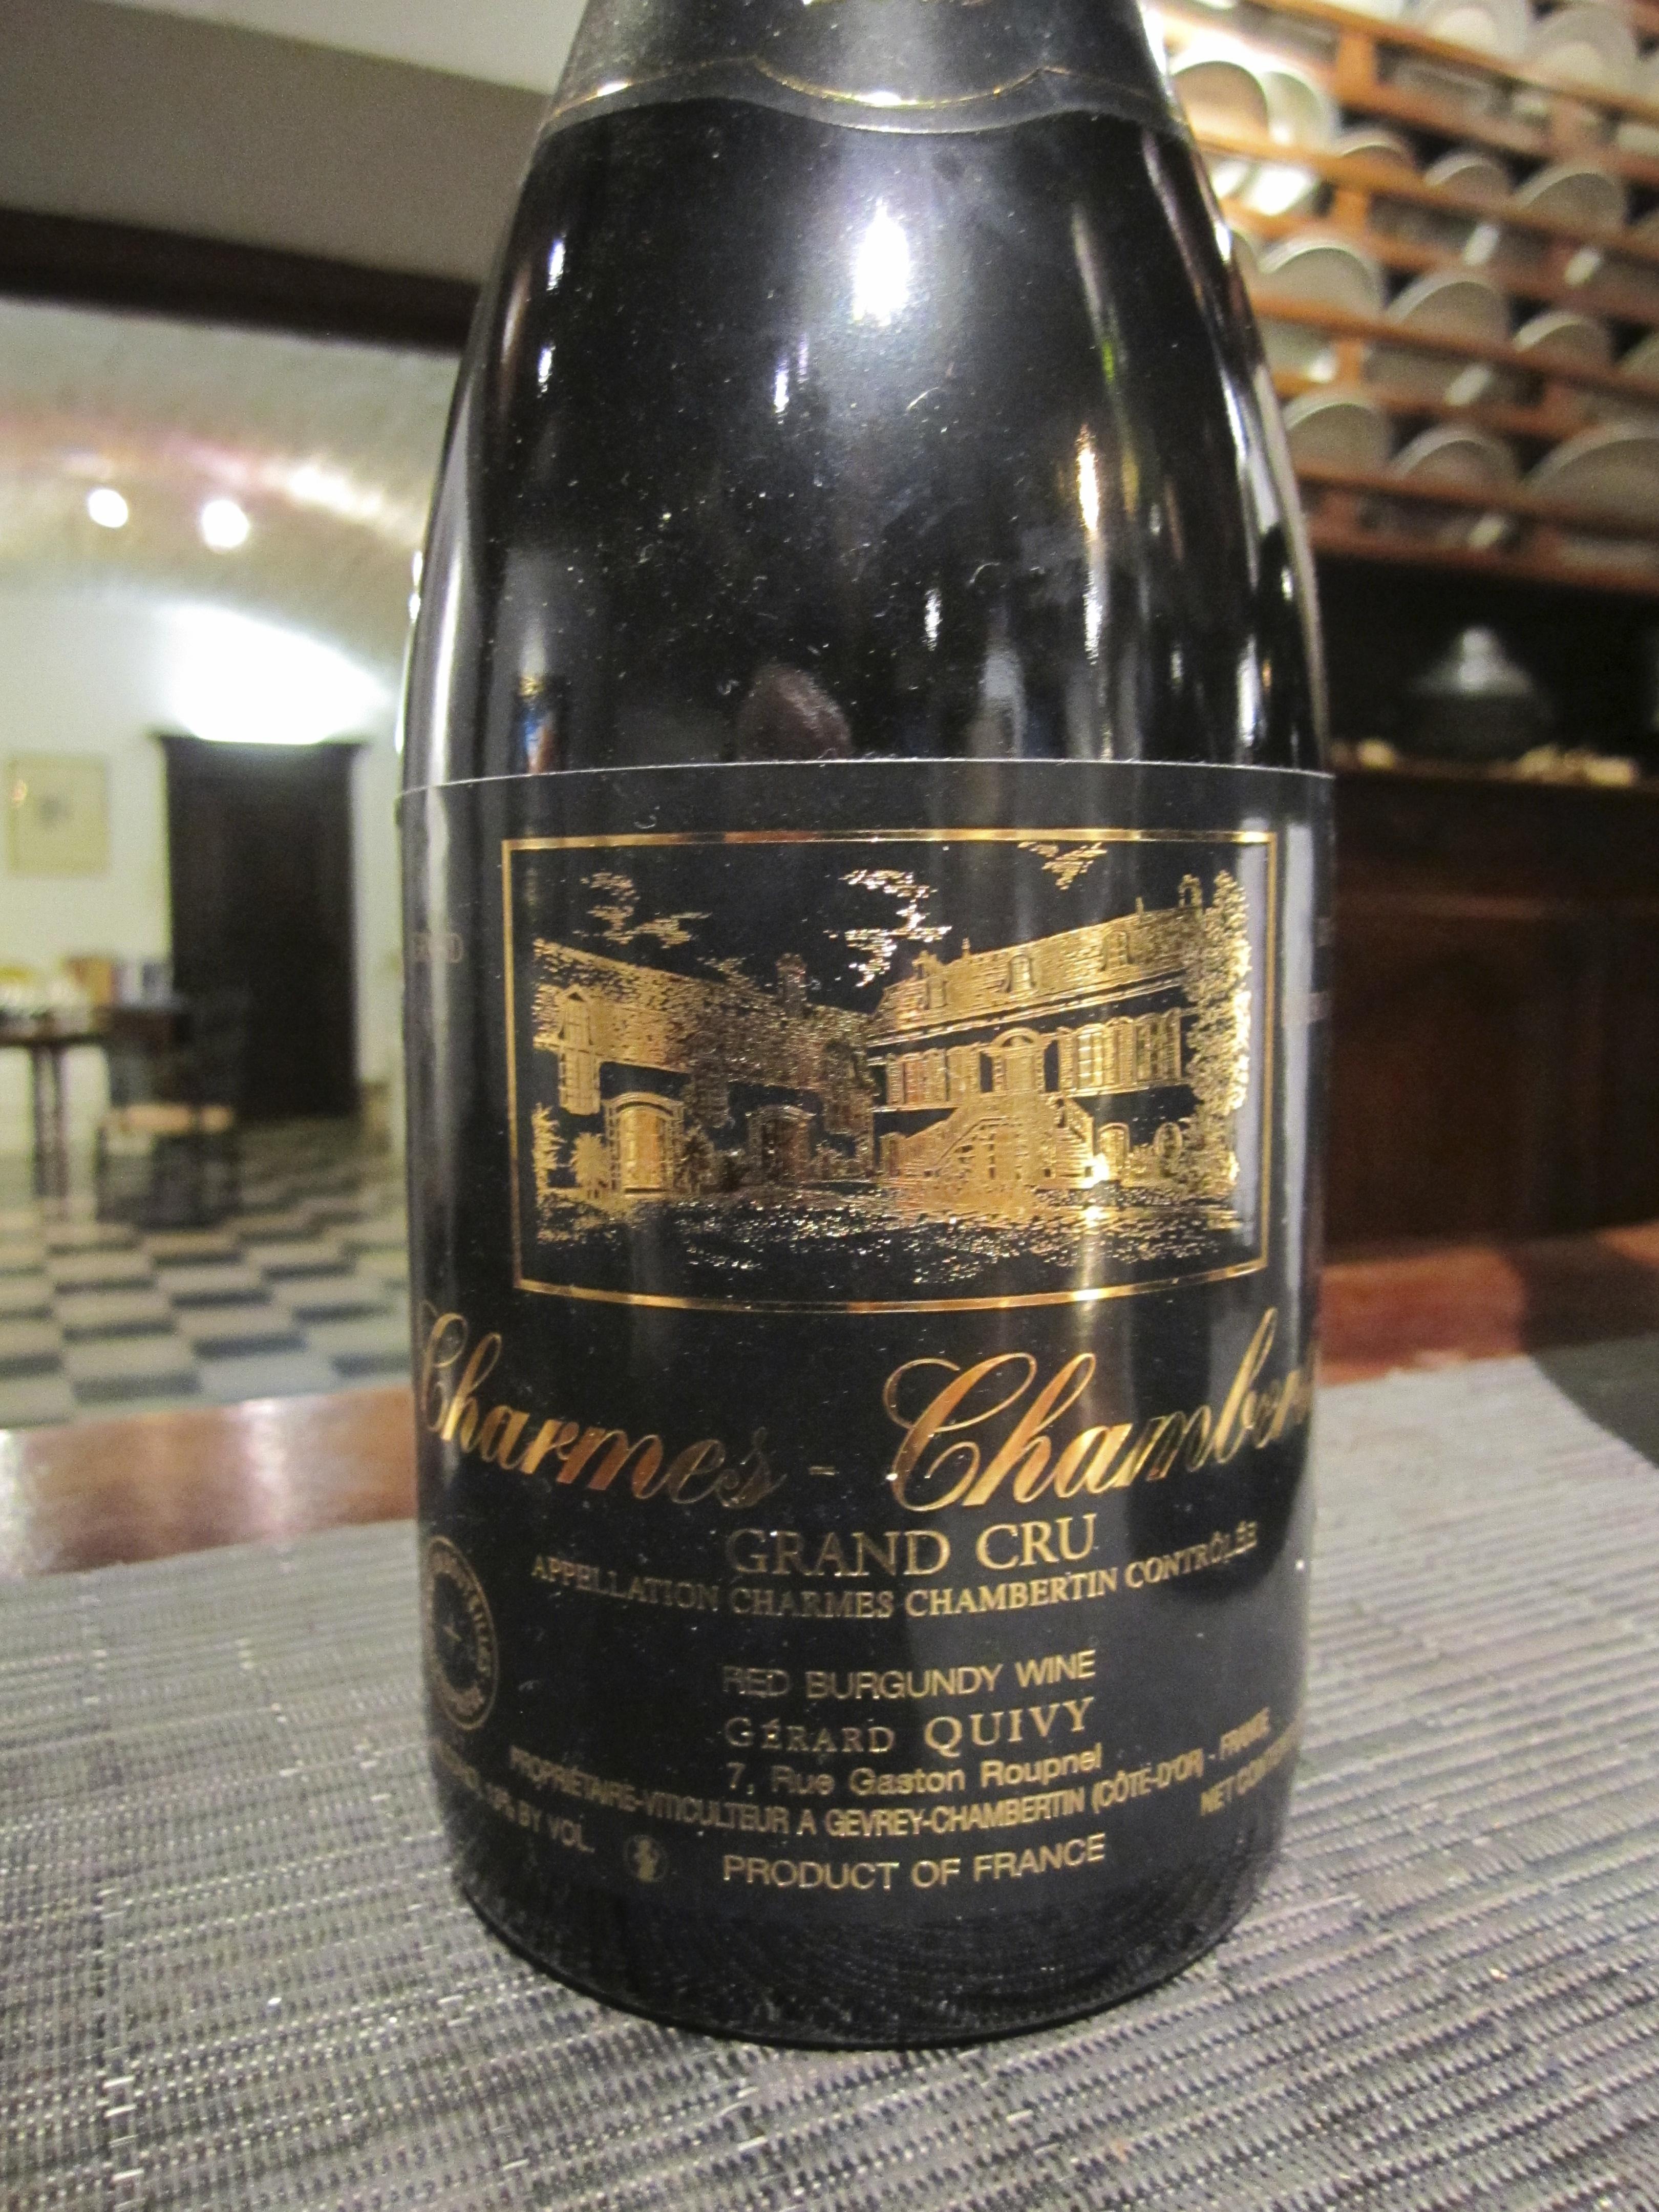 Gerard Quivy wine maker